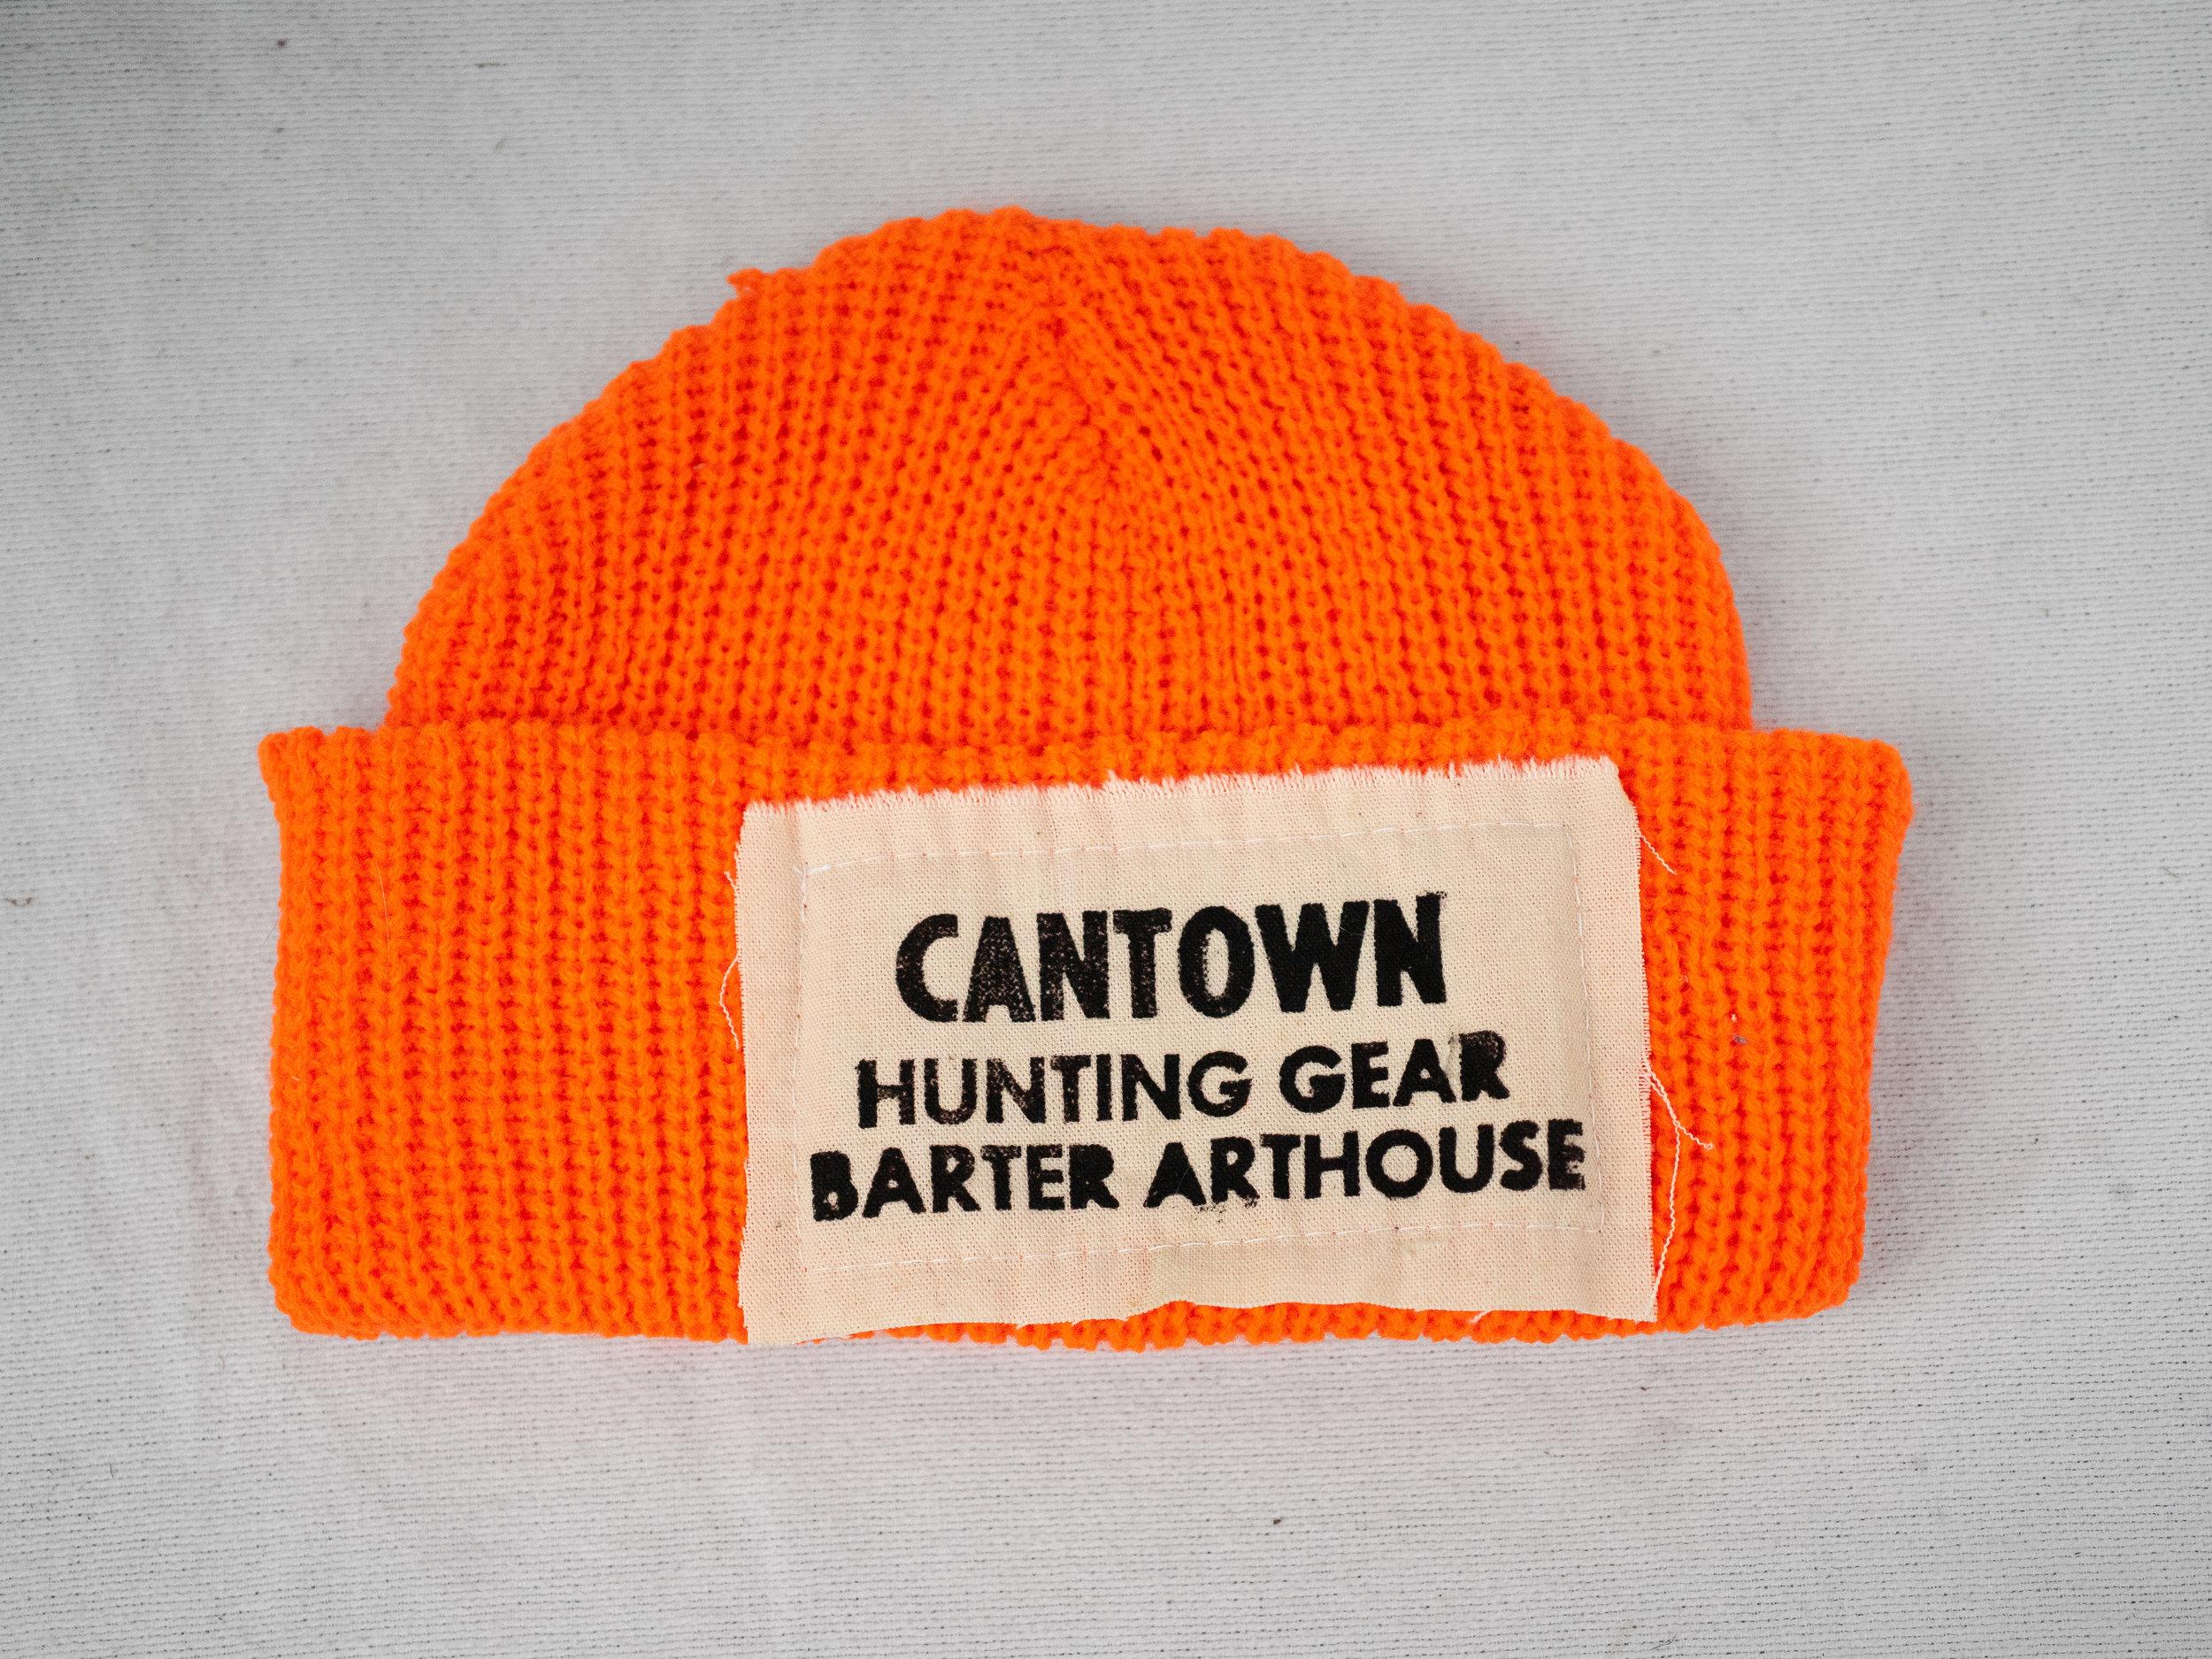 Matt Barter Cantown Hunting Gear Blaze Orange knit caps 30.00 quantity 5